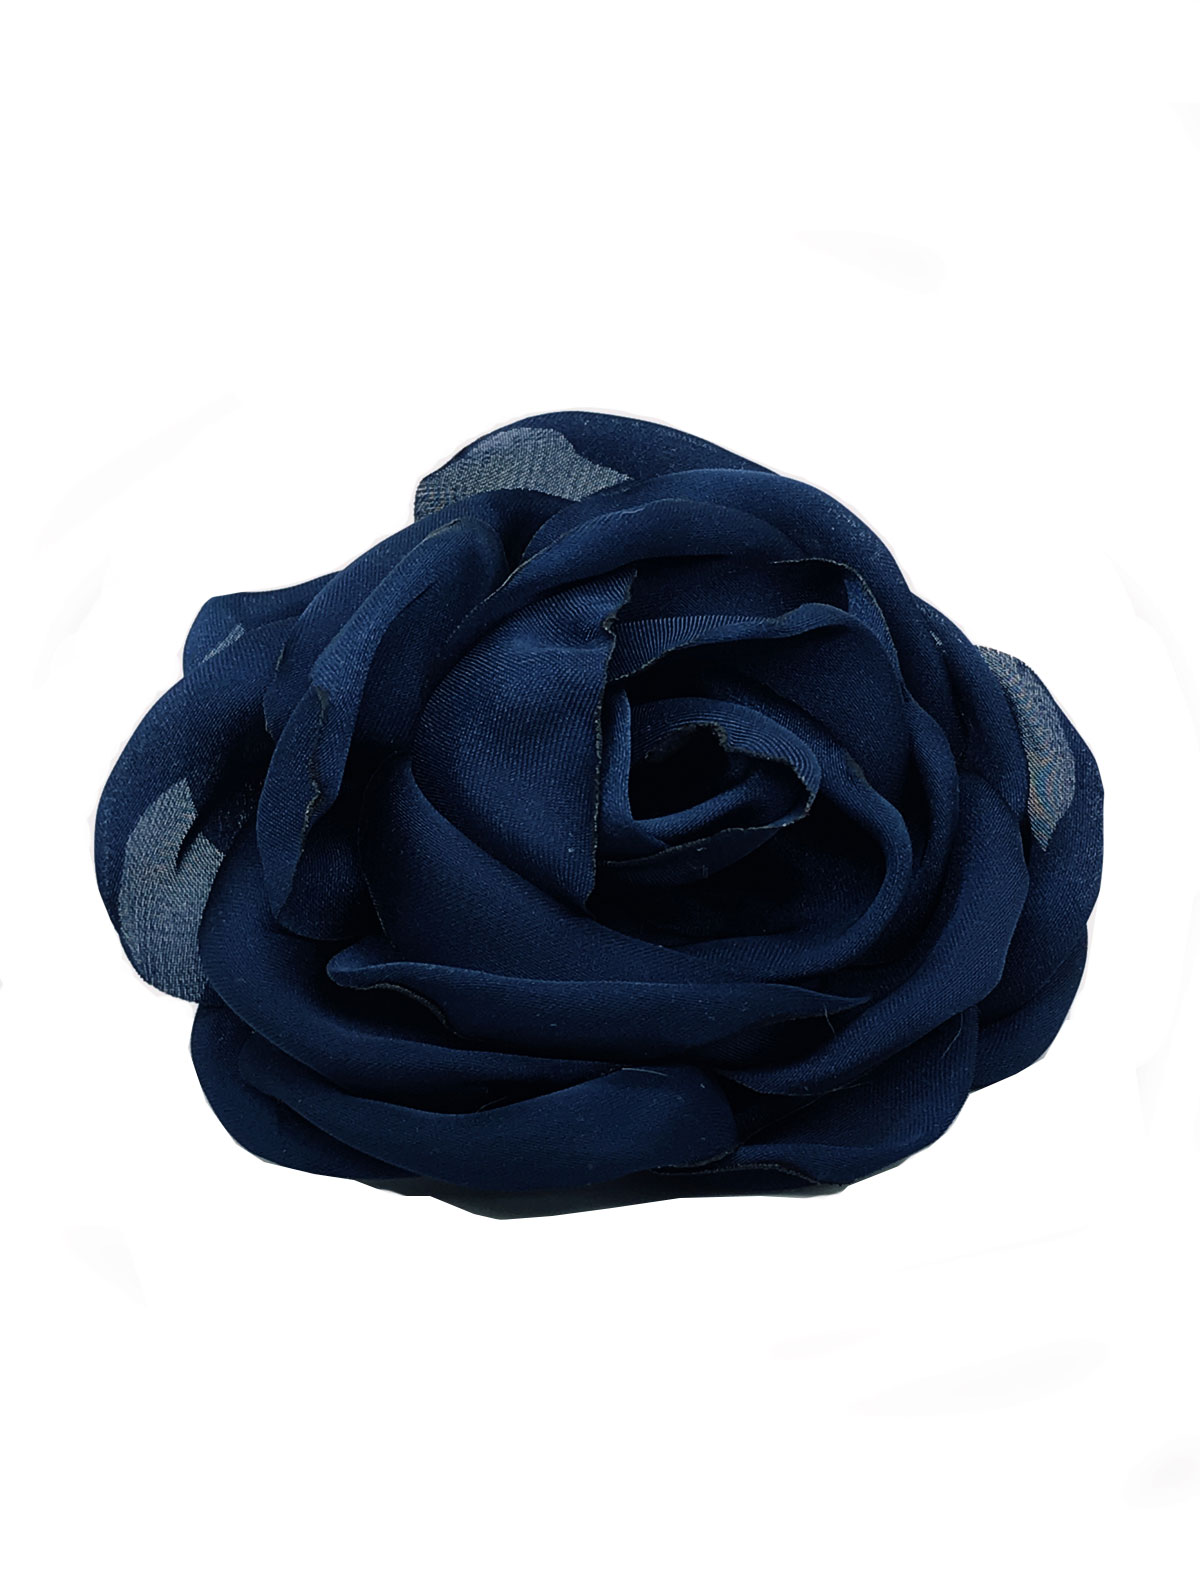 Заколка Junefee синего цвета